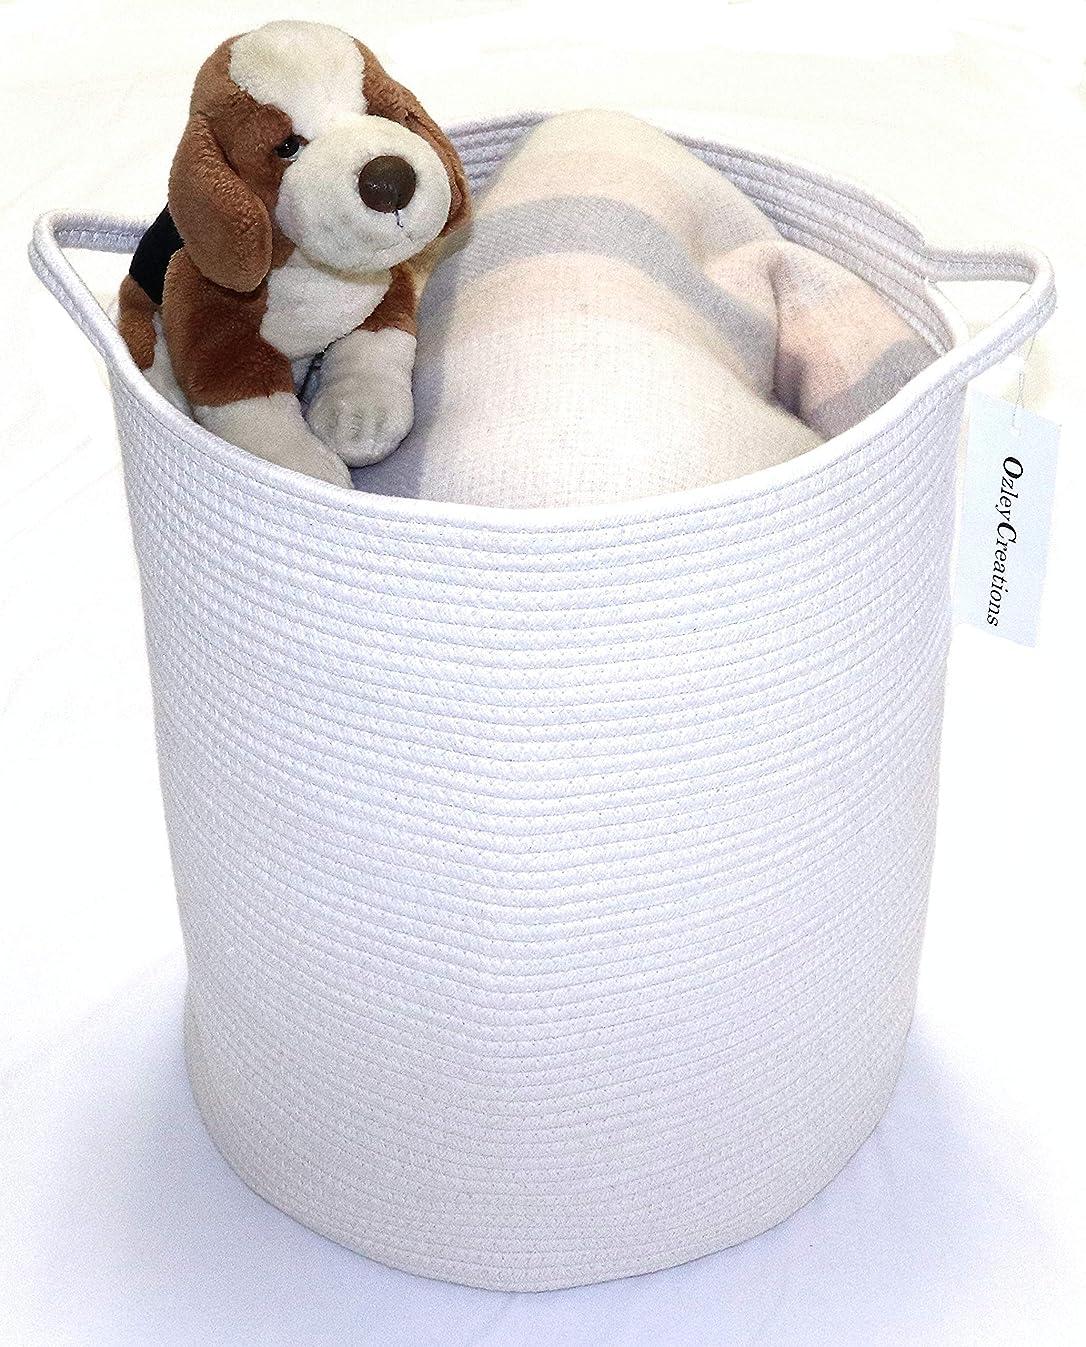 OZLEY Large Cotton Rope Basket | 18